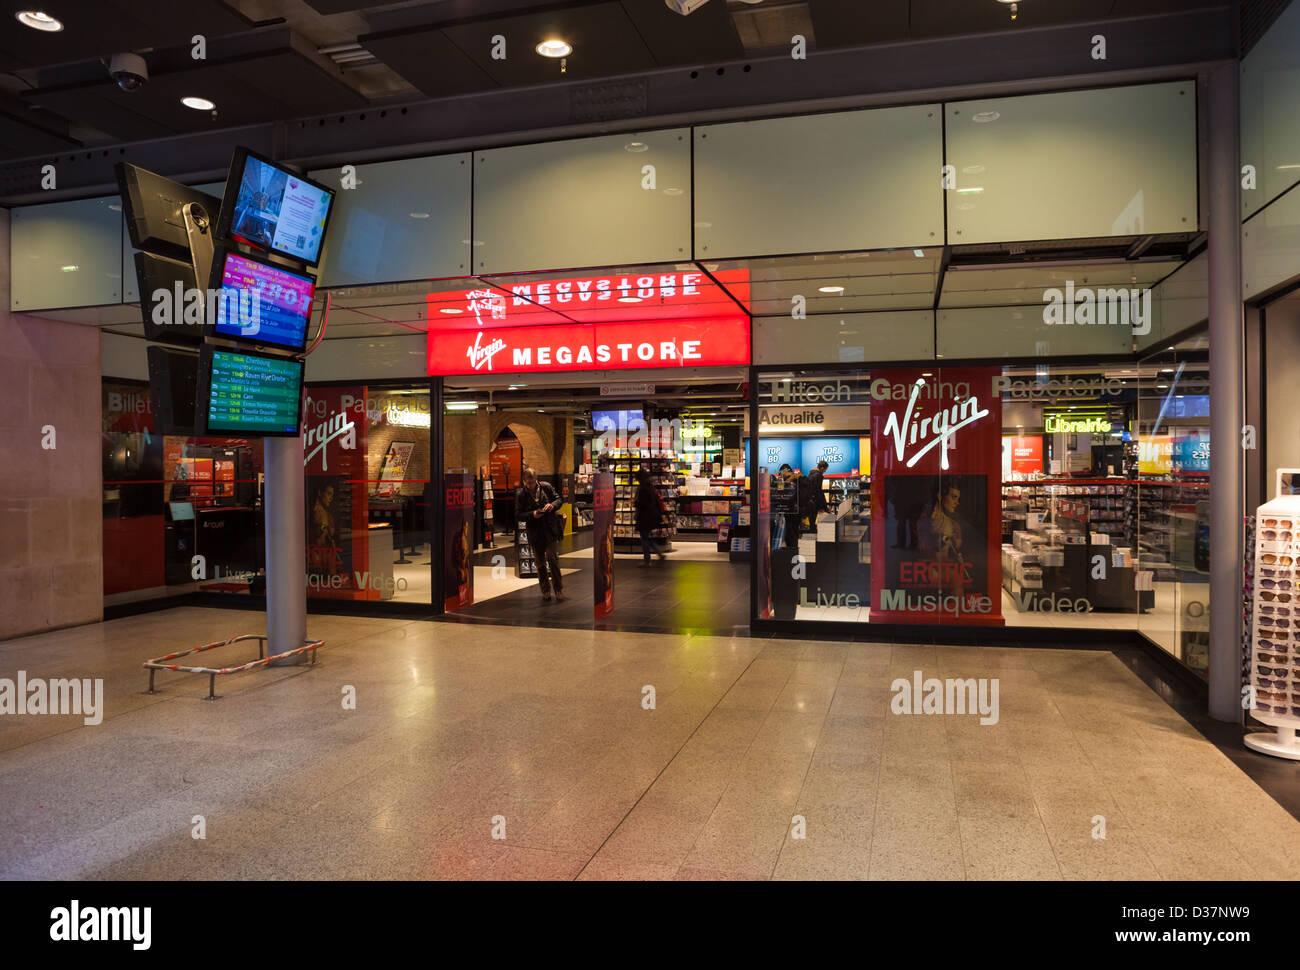 Virgin Megastore Paris France Stock Photos & Virgin